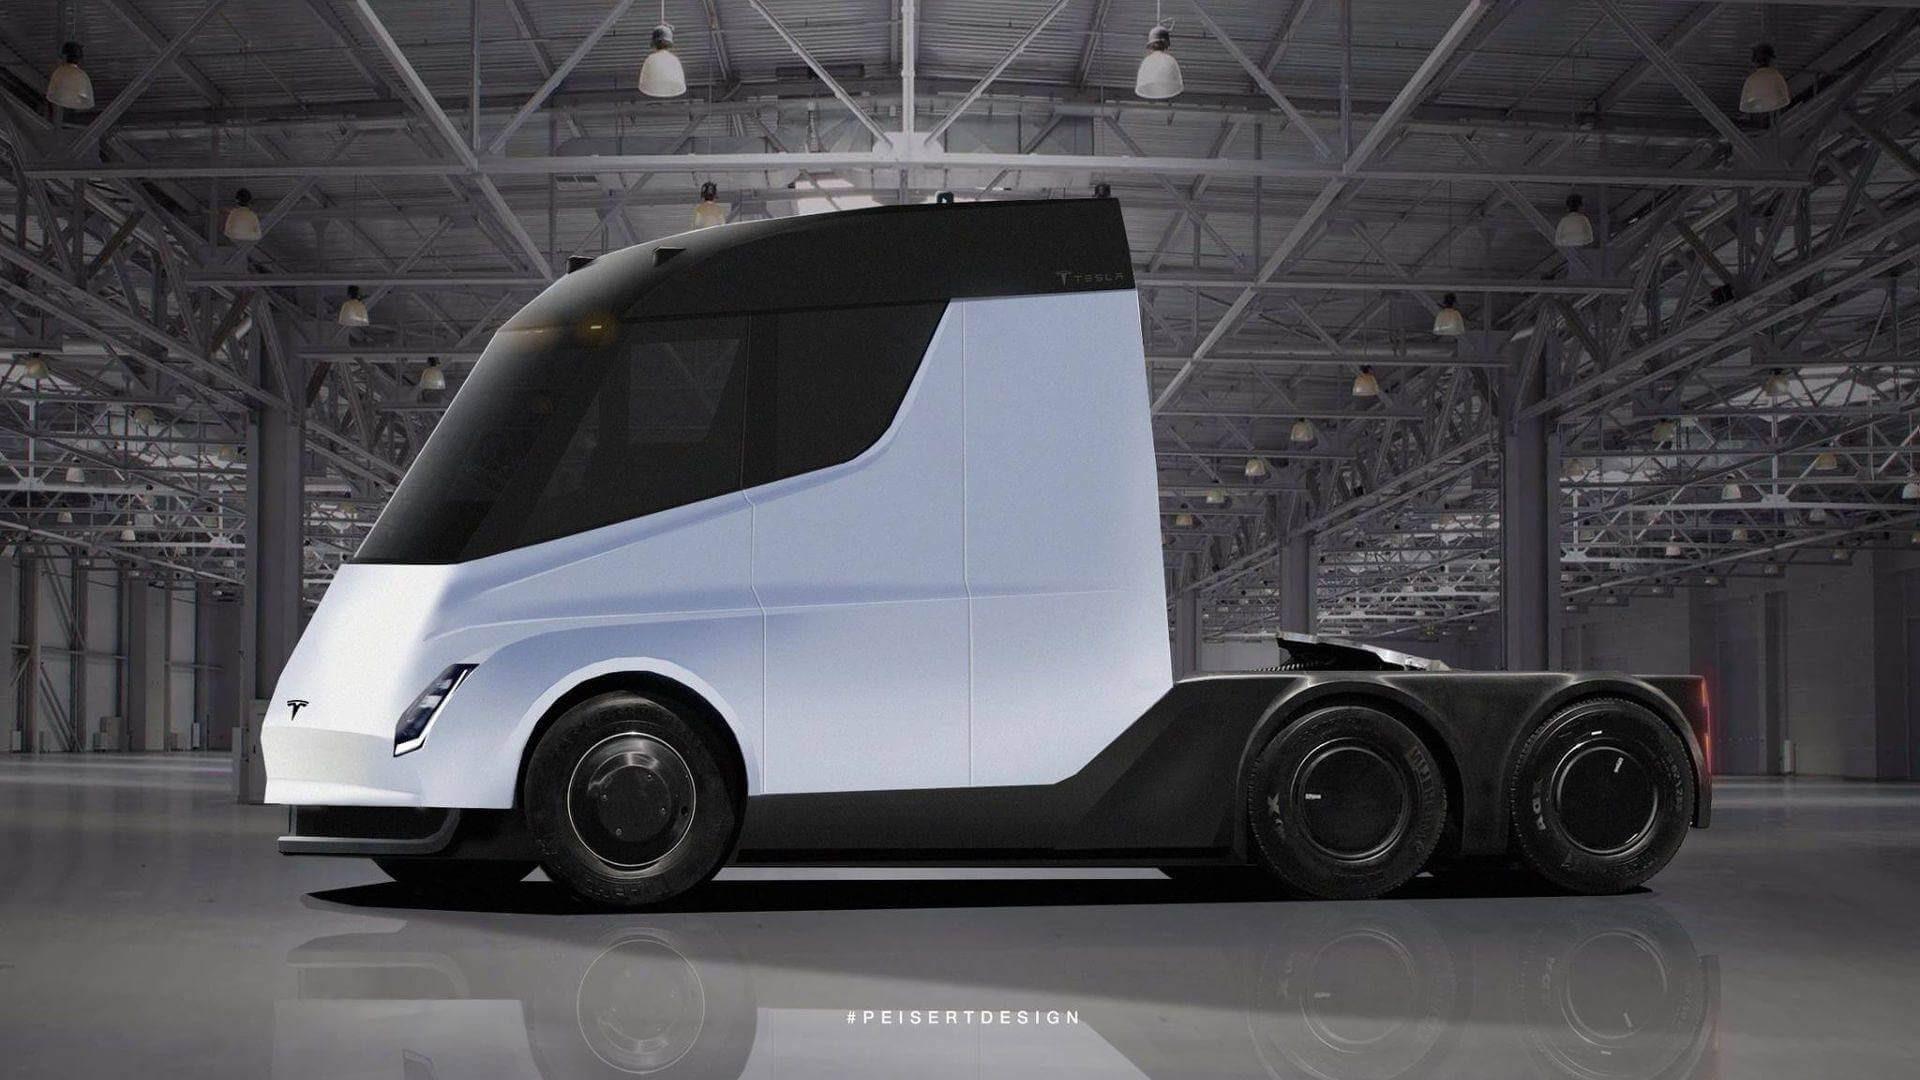 Anheuser-Busch заказала беспилотные фургоны Tesla